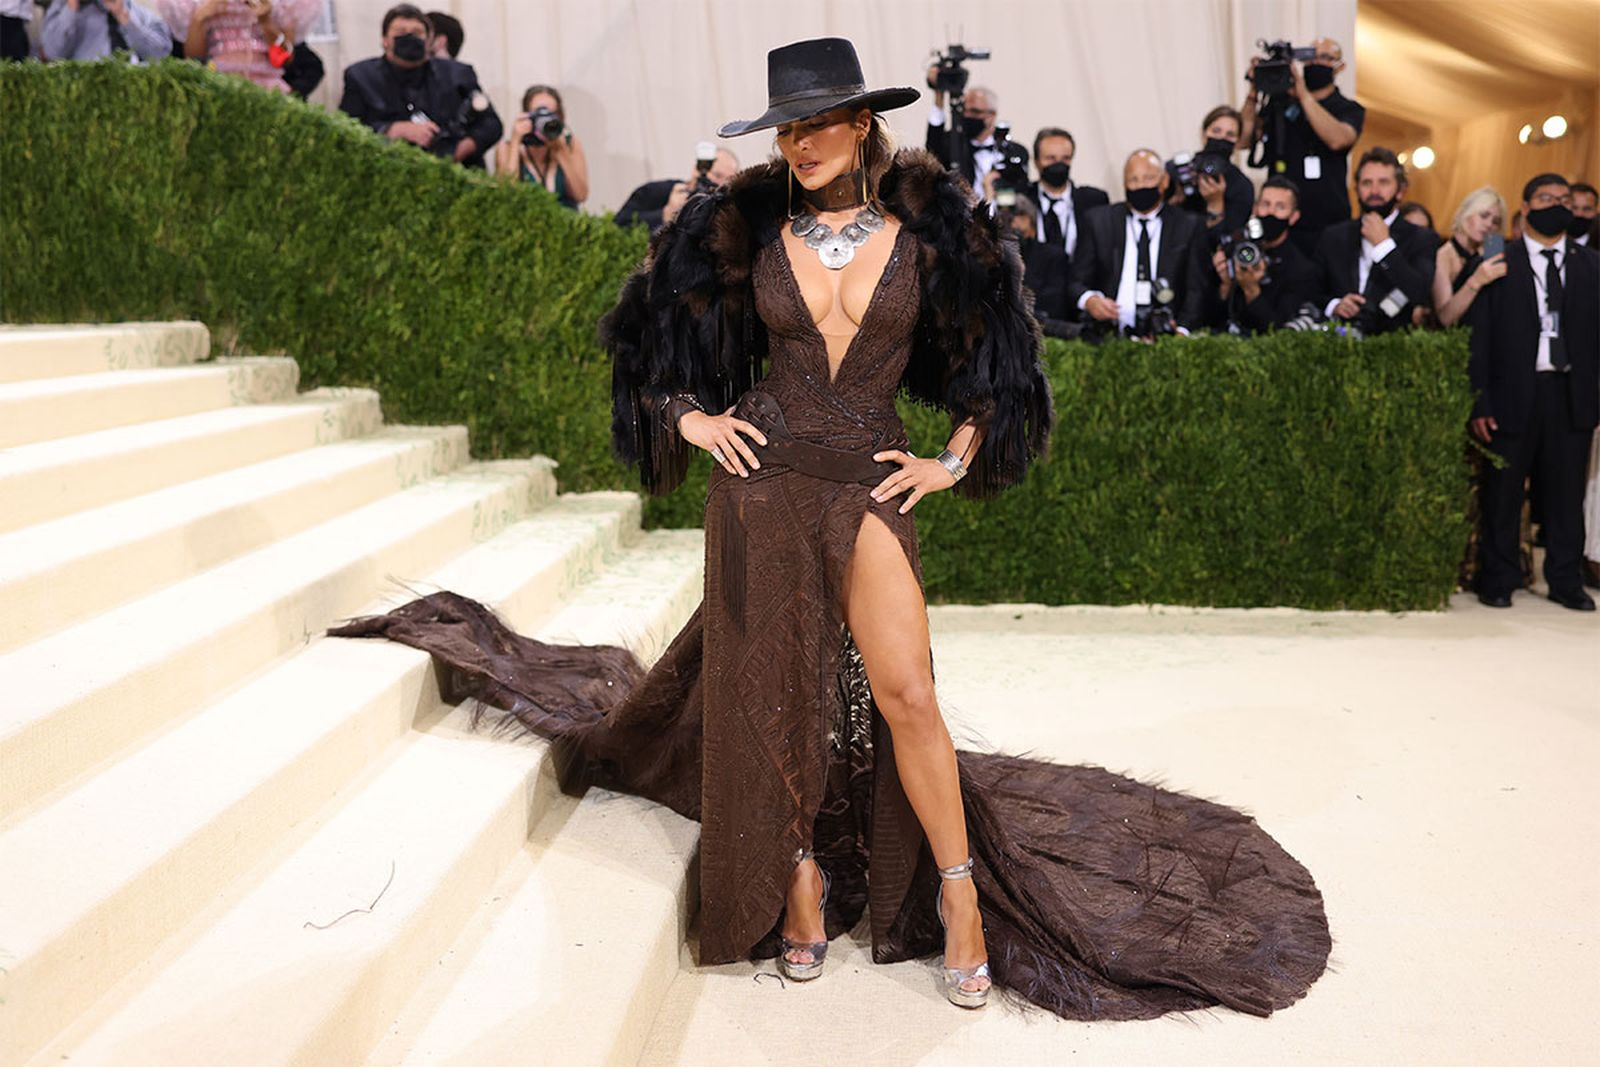 met gala 2021 celebrity style looks best outfits red carpet worst jennifer lopez jlo